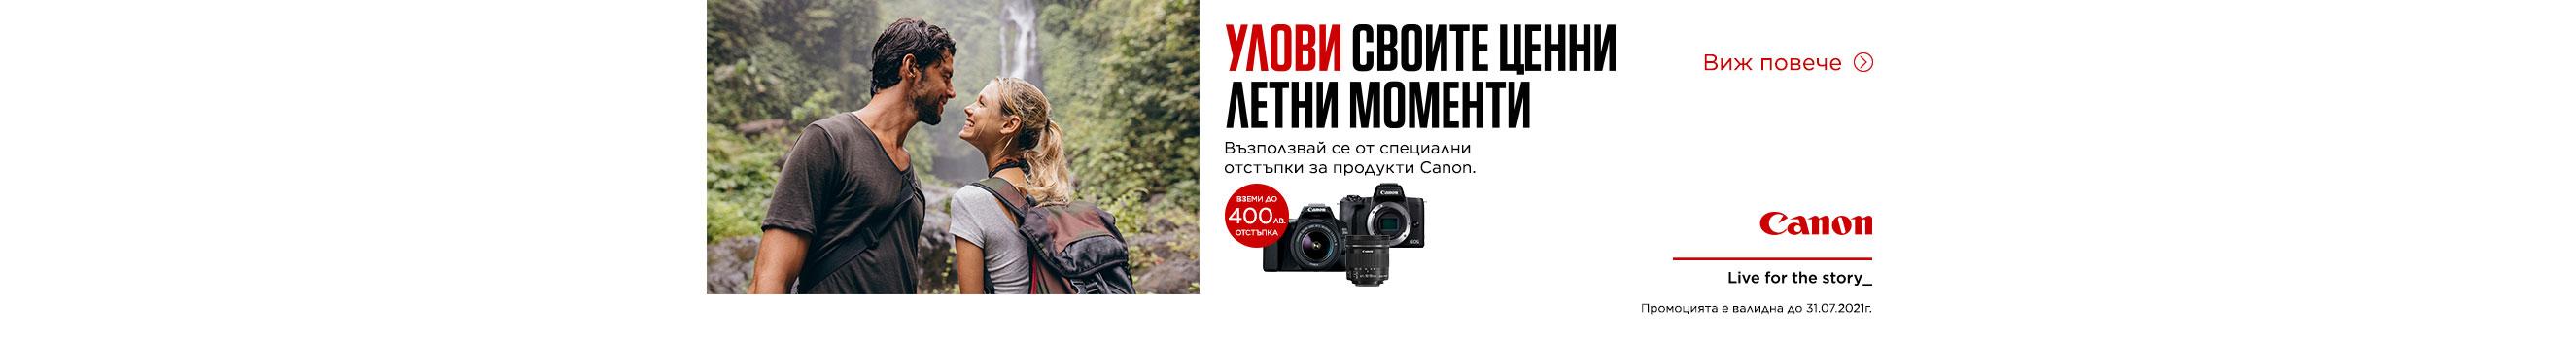 До 400 лв. отстъпка за избрани модели Canon